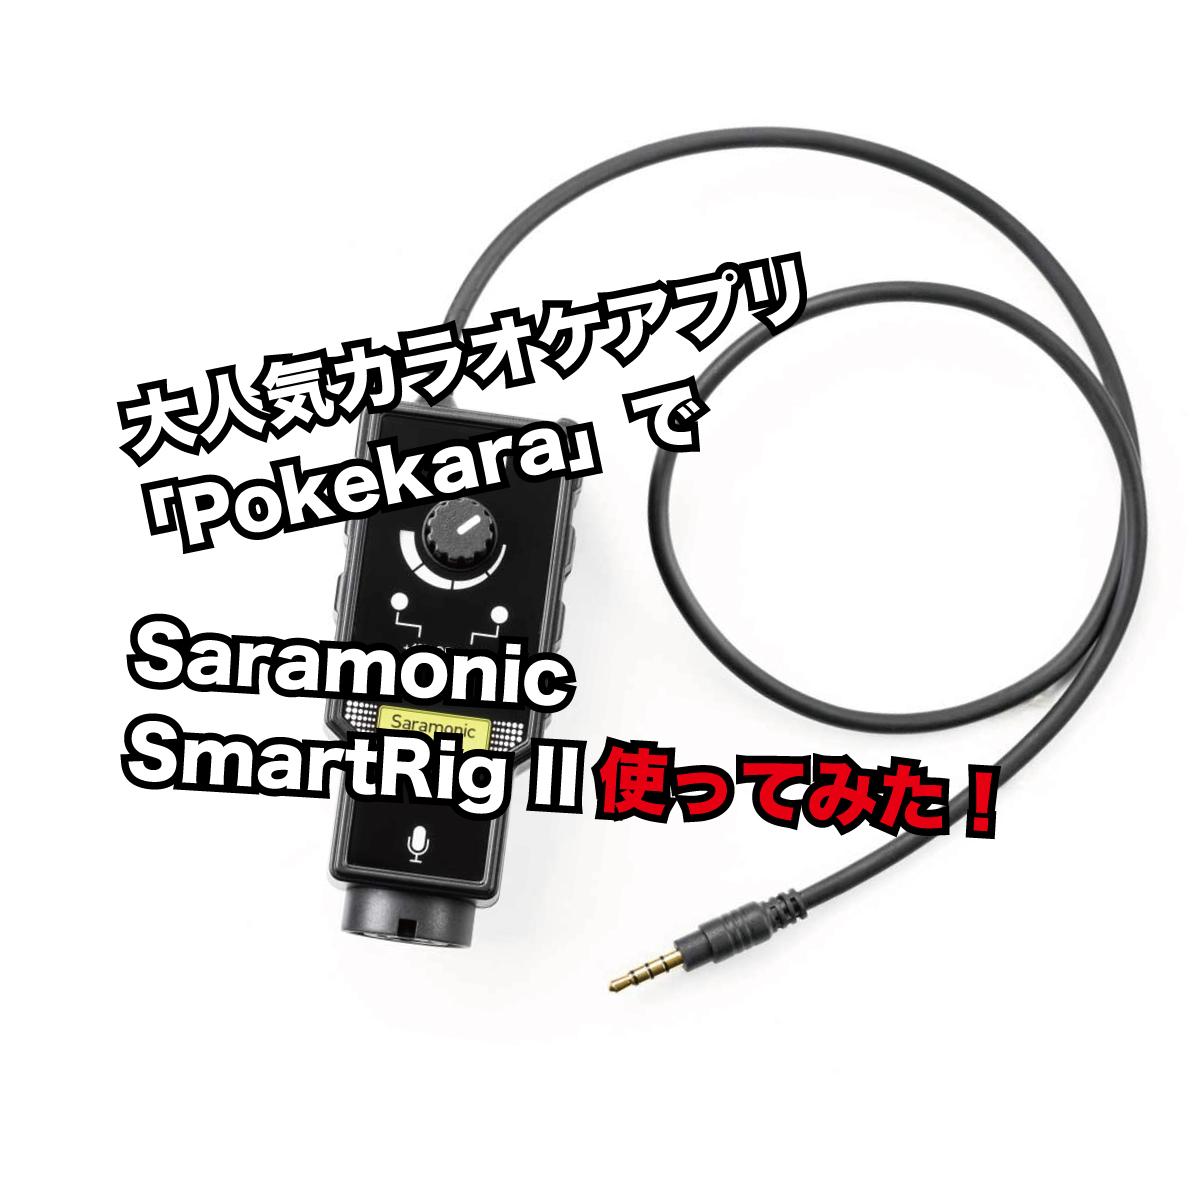 「Pokekara(ポケカラ)」Saramonic SmartRig IIを使ってやってみた!